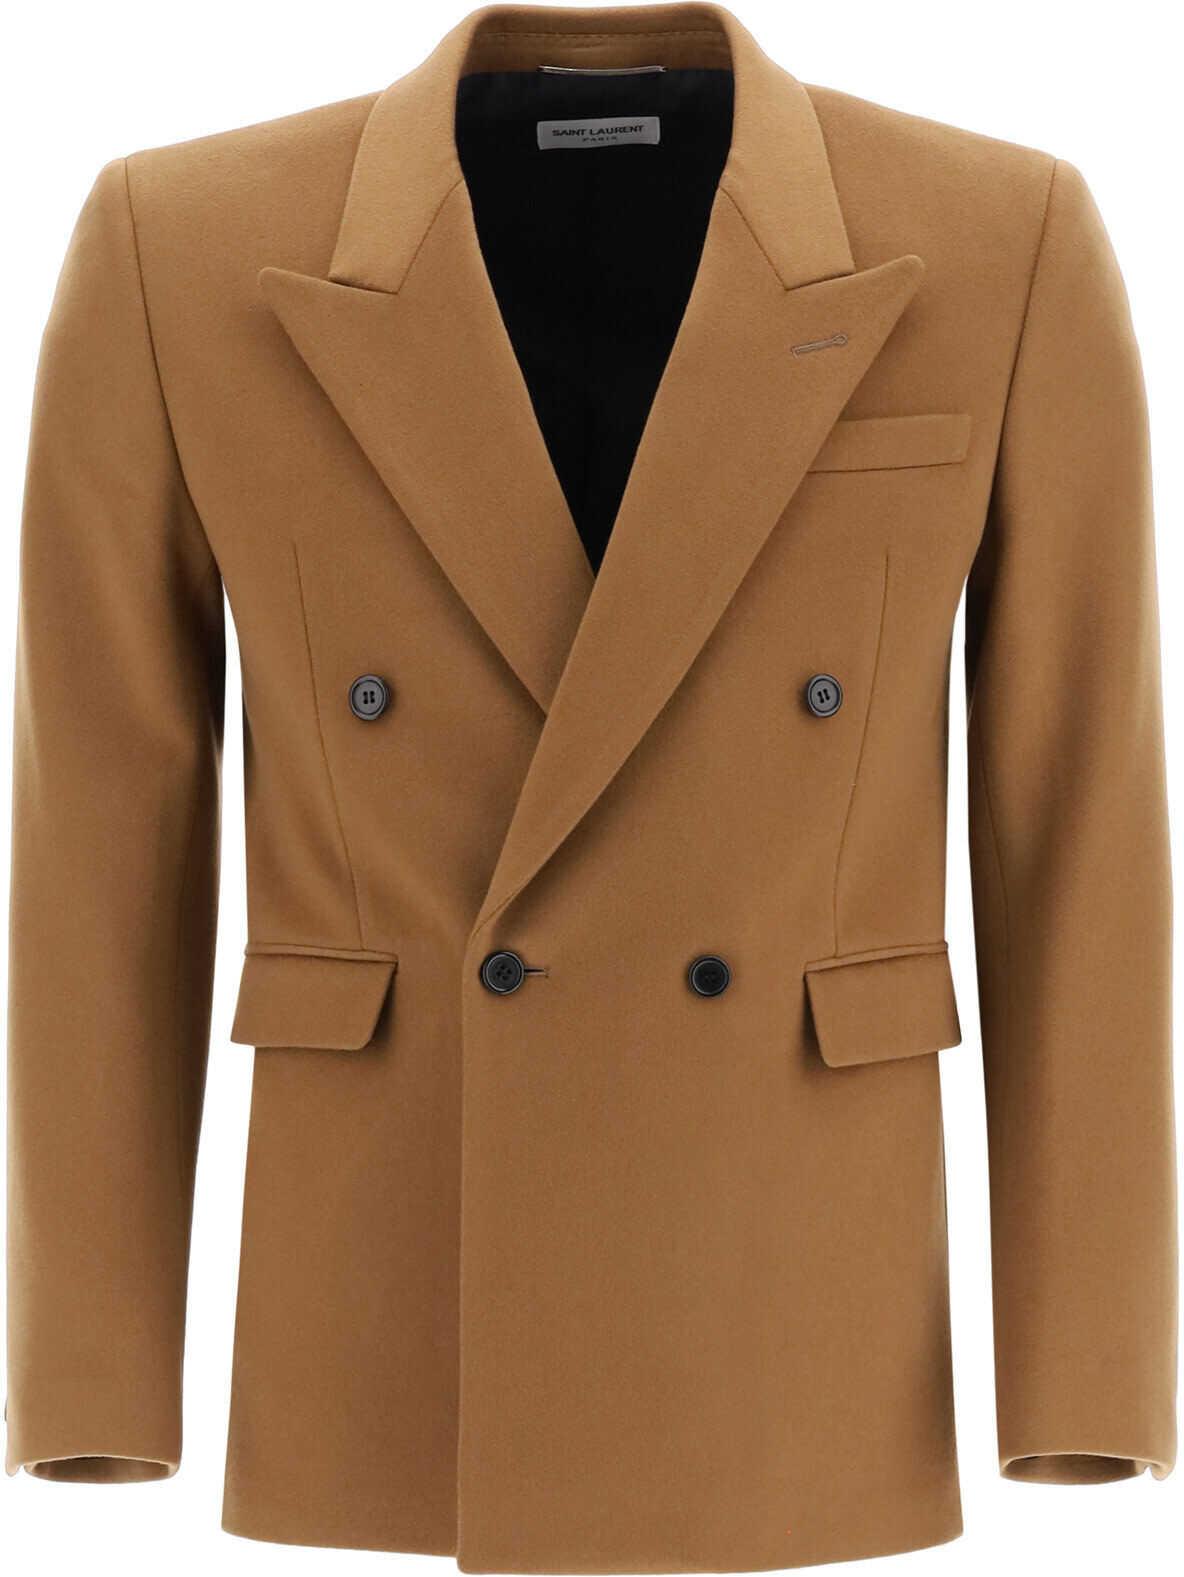 Saint Laurent Double-Breasted Jacket CAMEL VINTAGE imagine